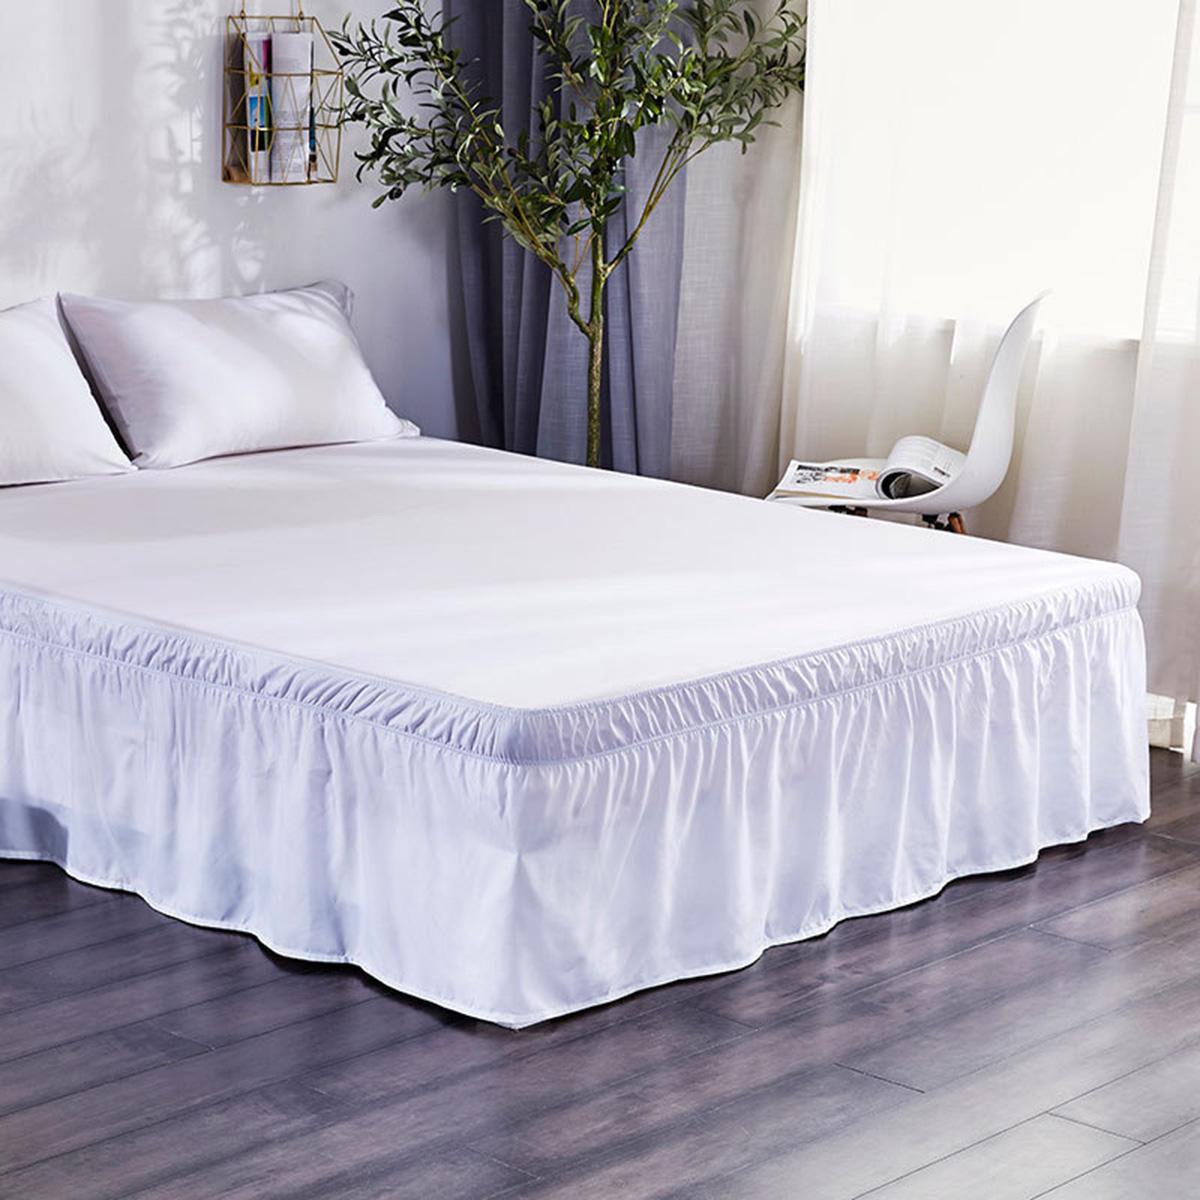 King Size Bedding Skirt Sheet Drop